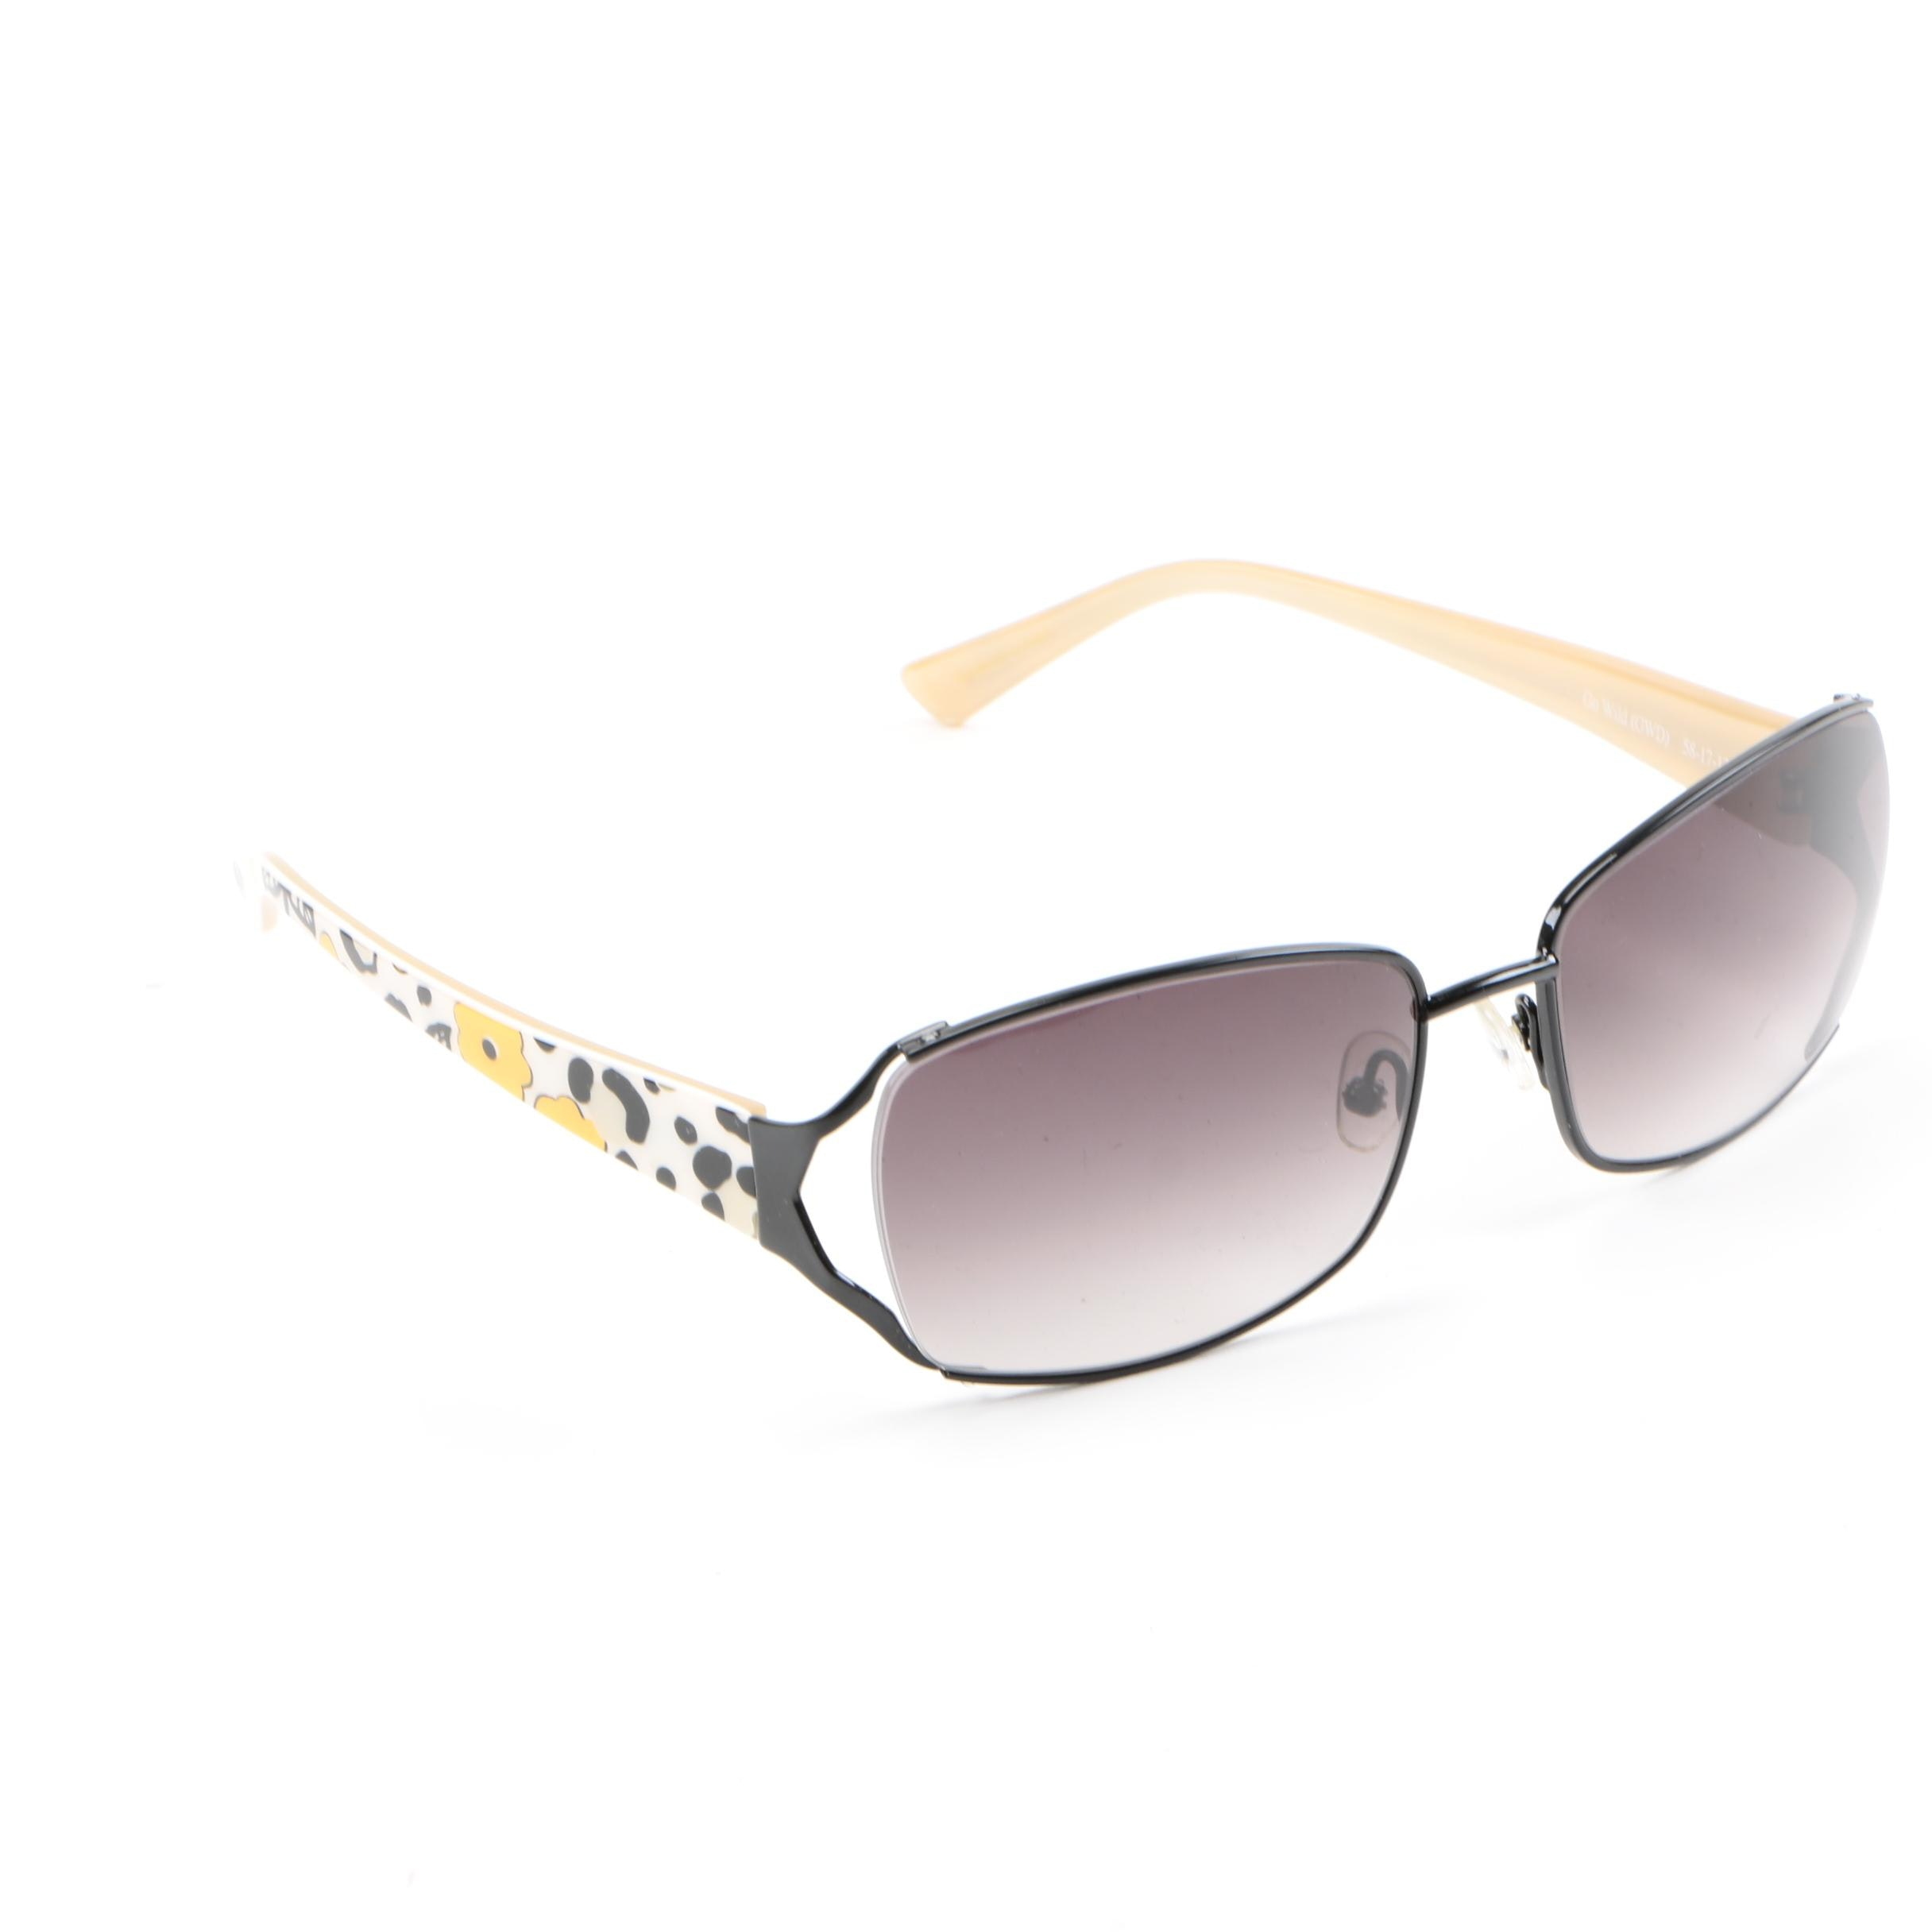 Sunglasses and Case by Vera Bradley